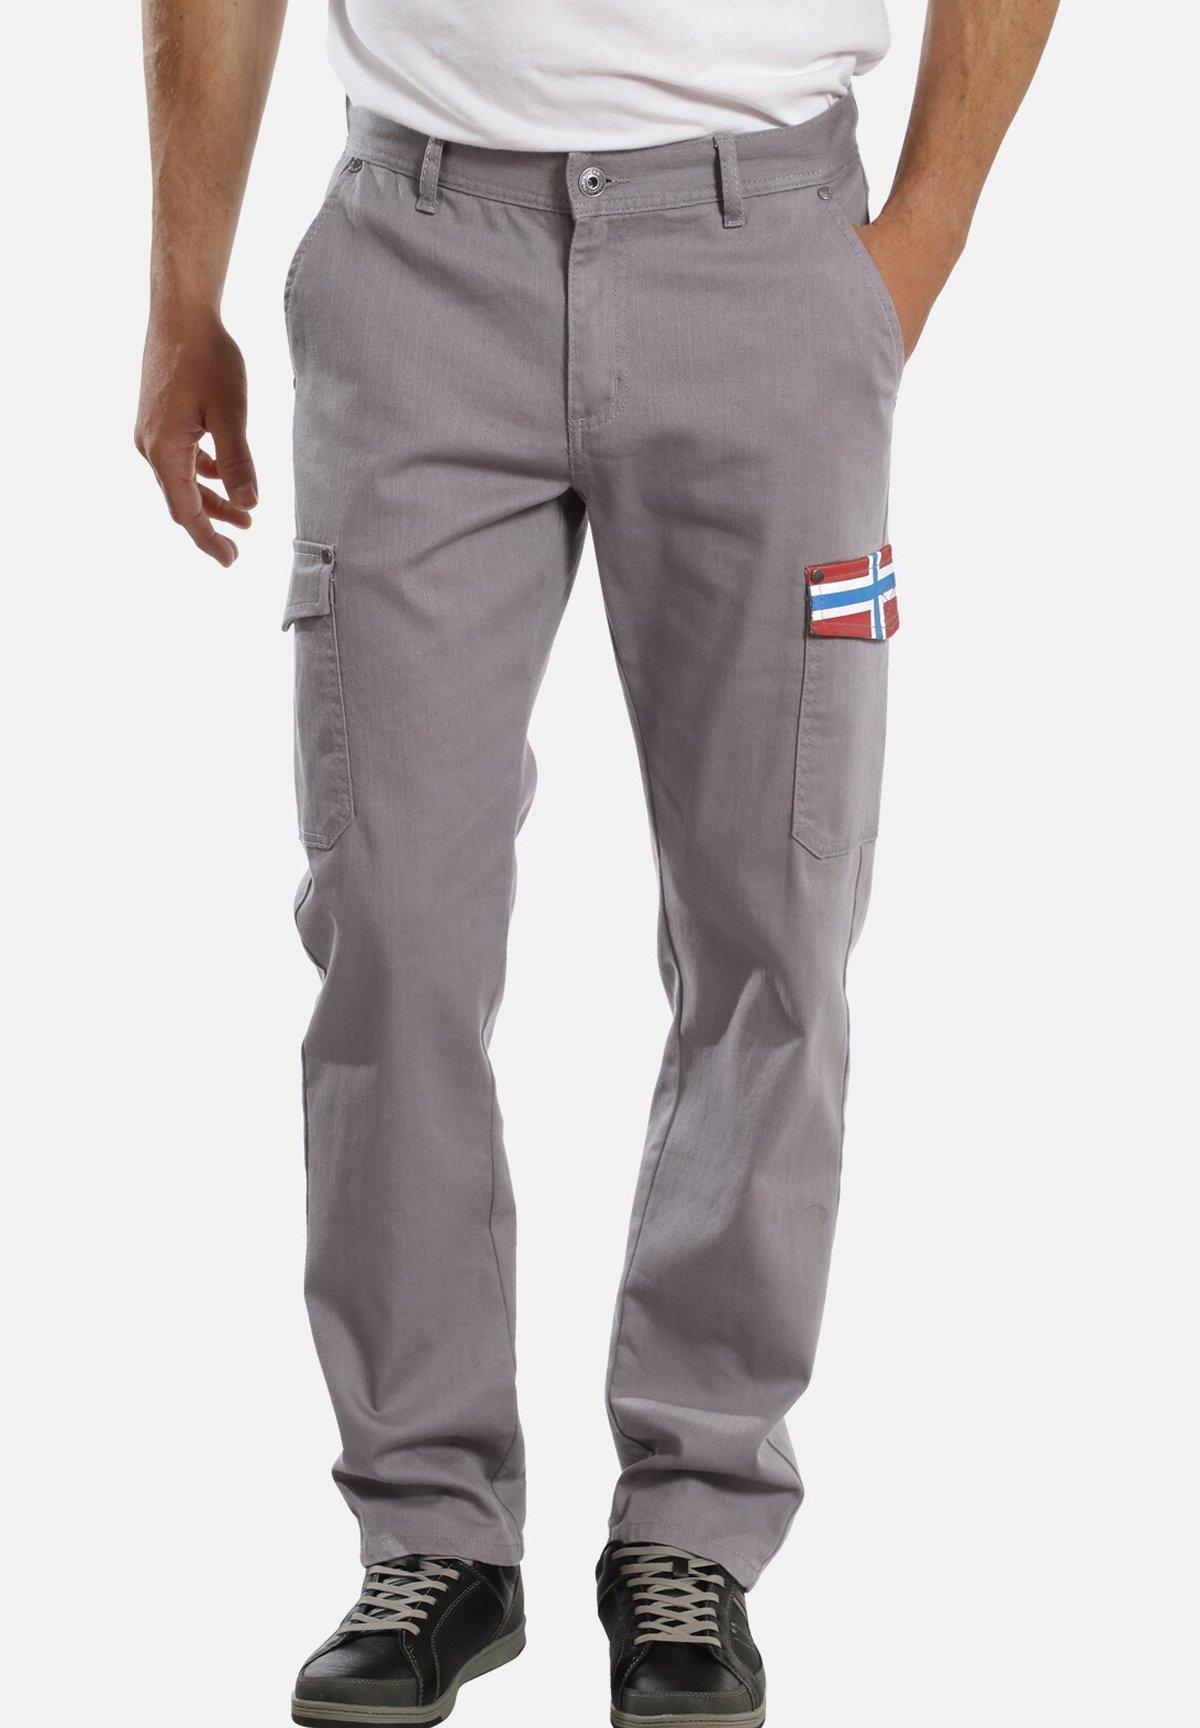 Homme LAIRGNEN - Pantalon cargo